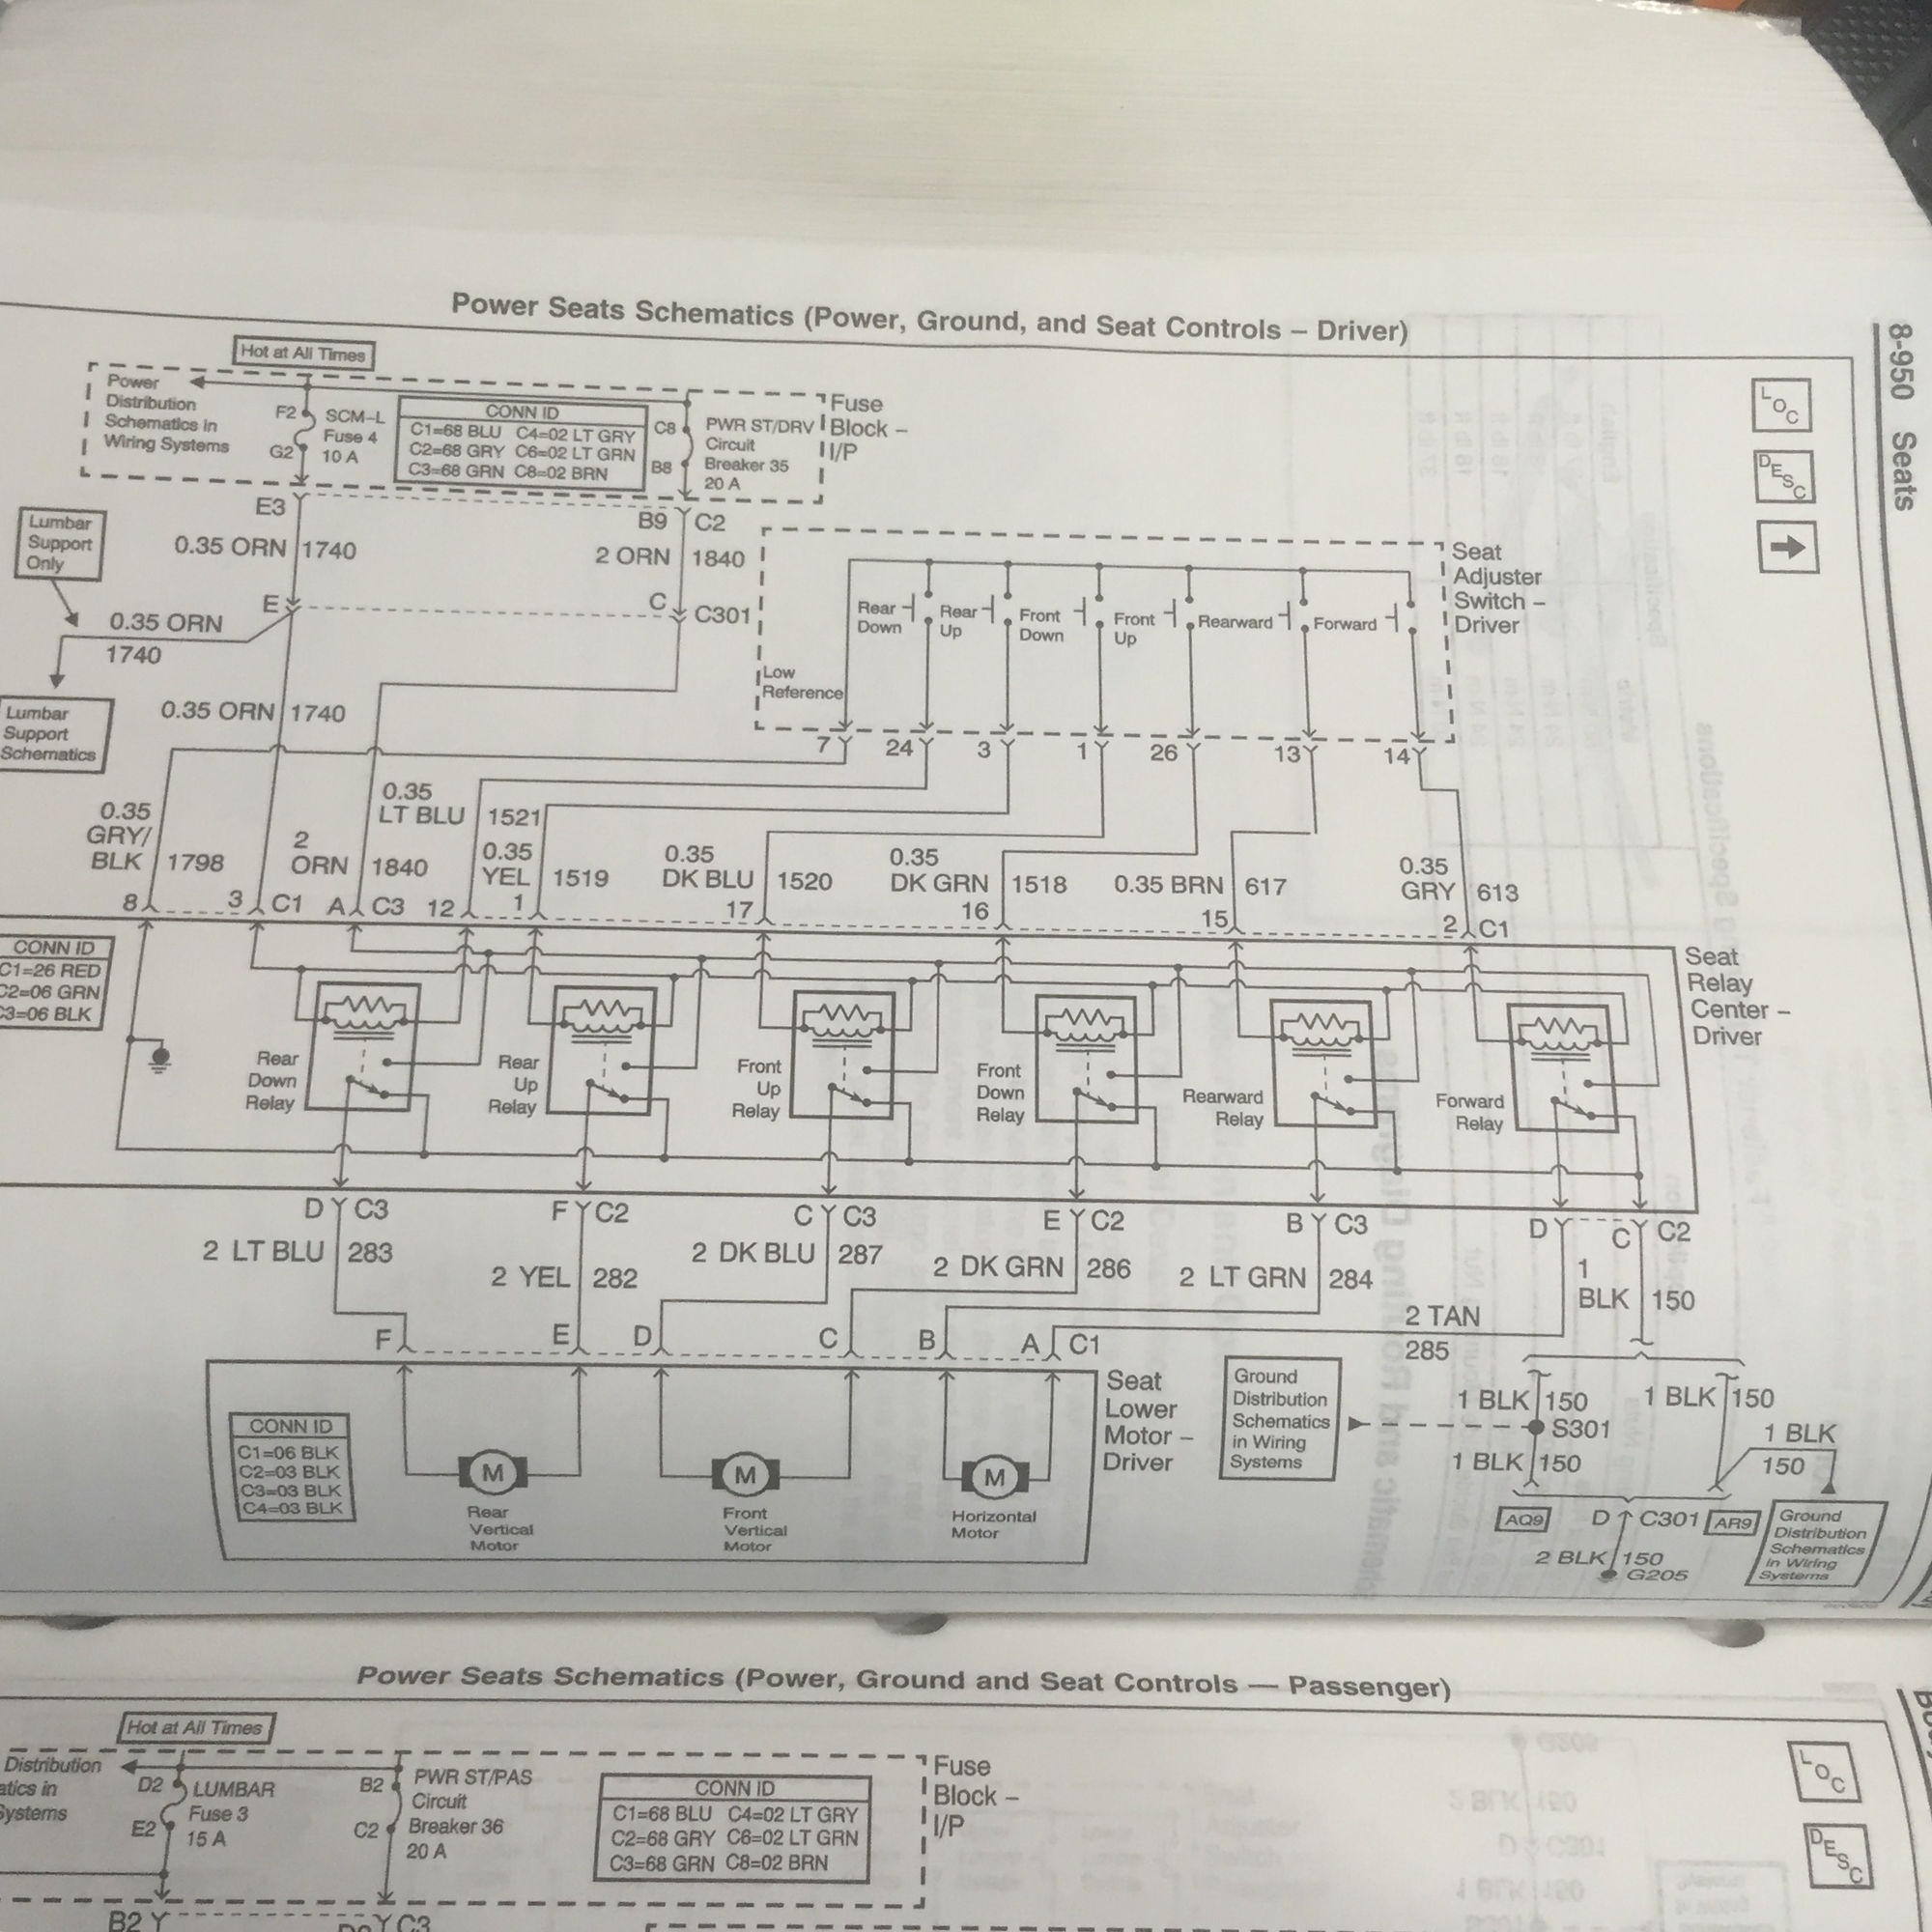 c5 corvette power seat wiring diagram hopkins 20100 corvetteforum chevrolet